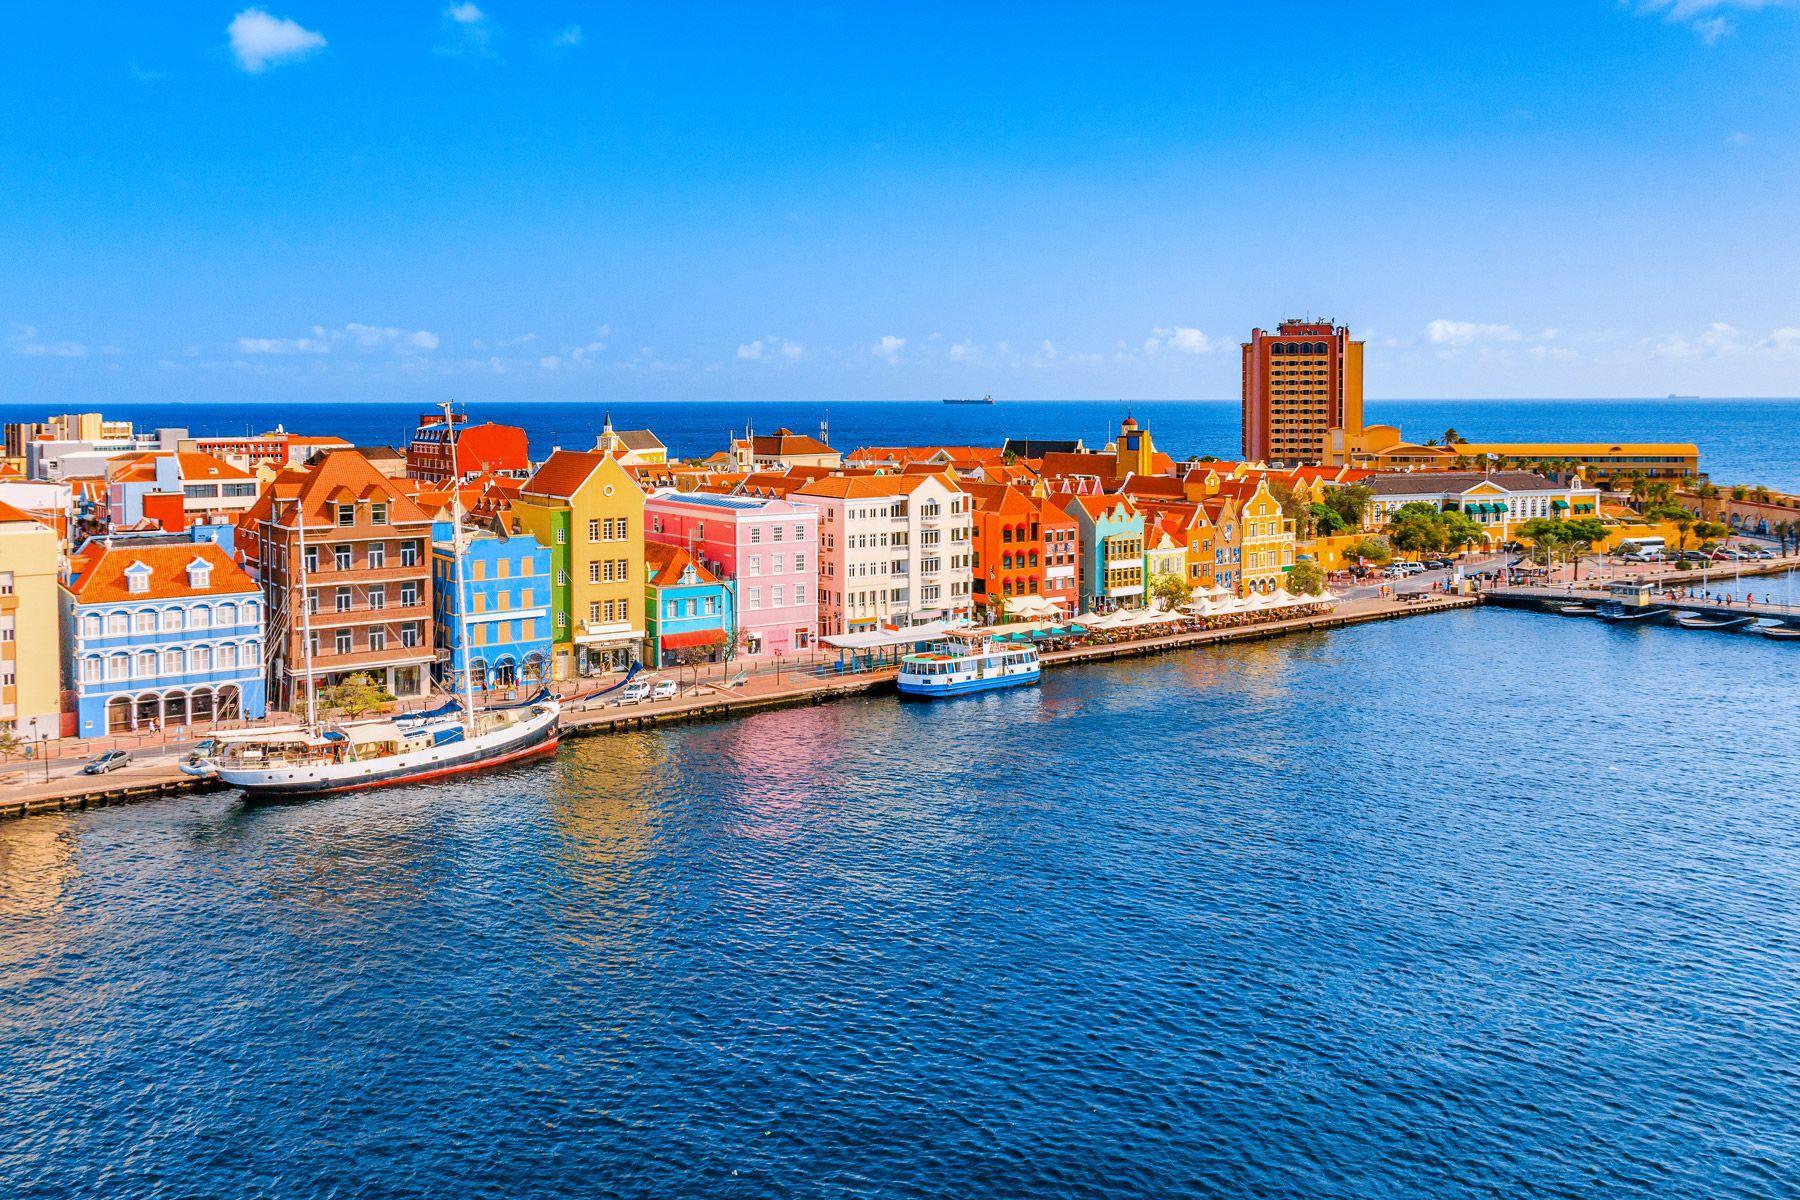 Willemstad Curacao Netherlands Antilles